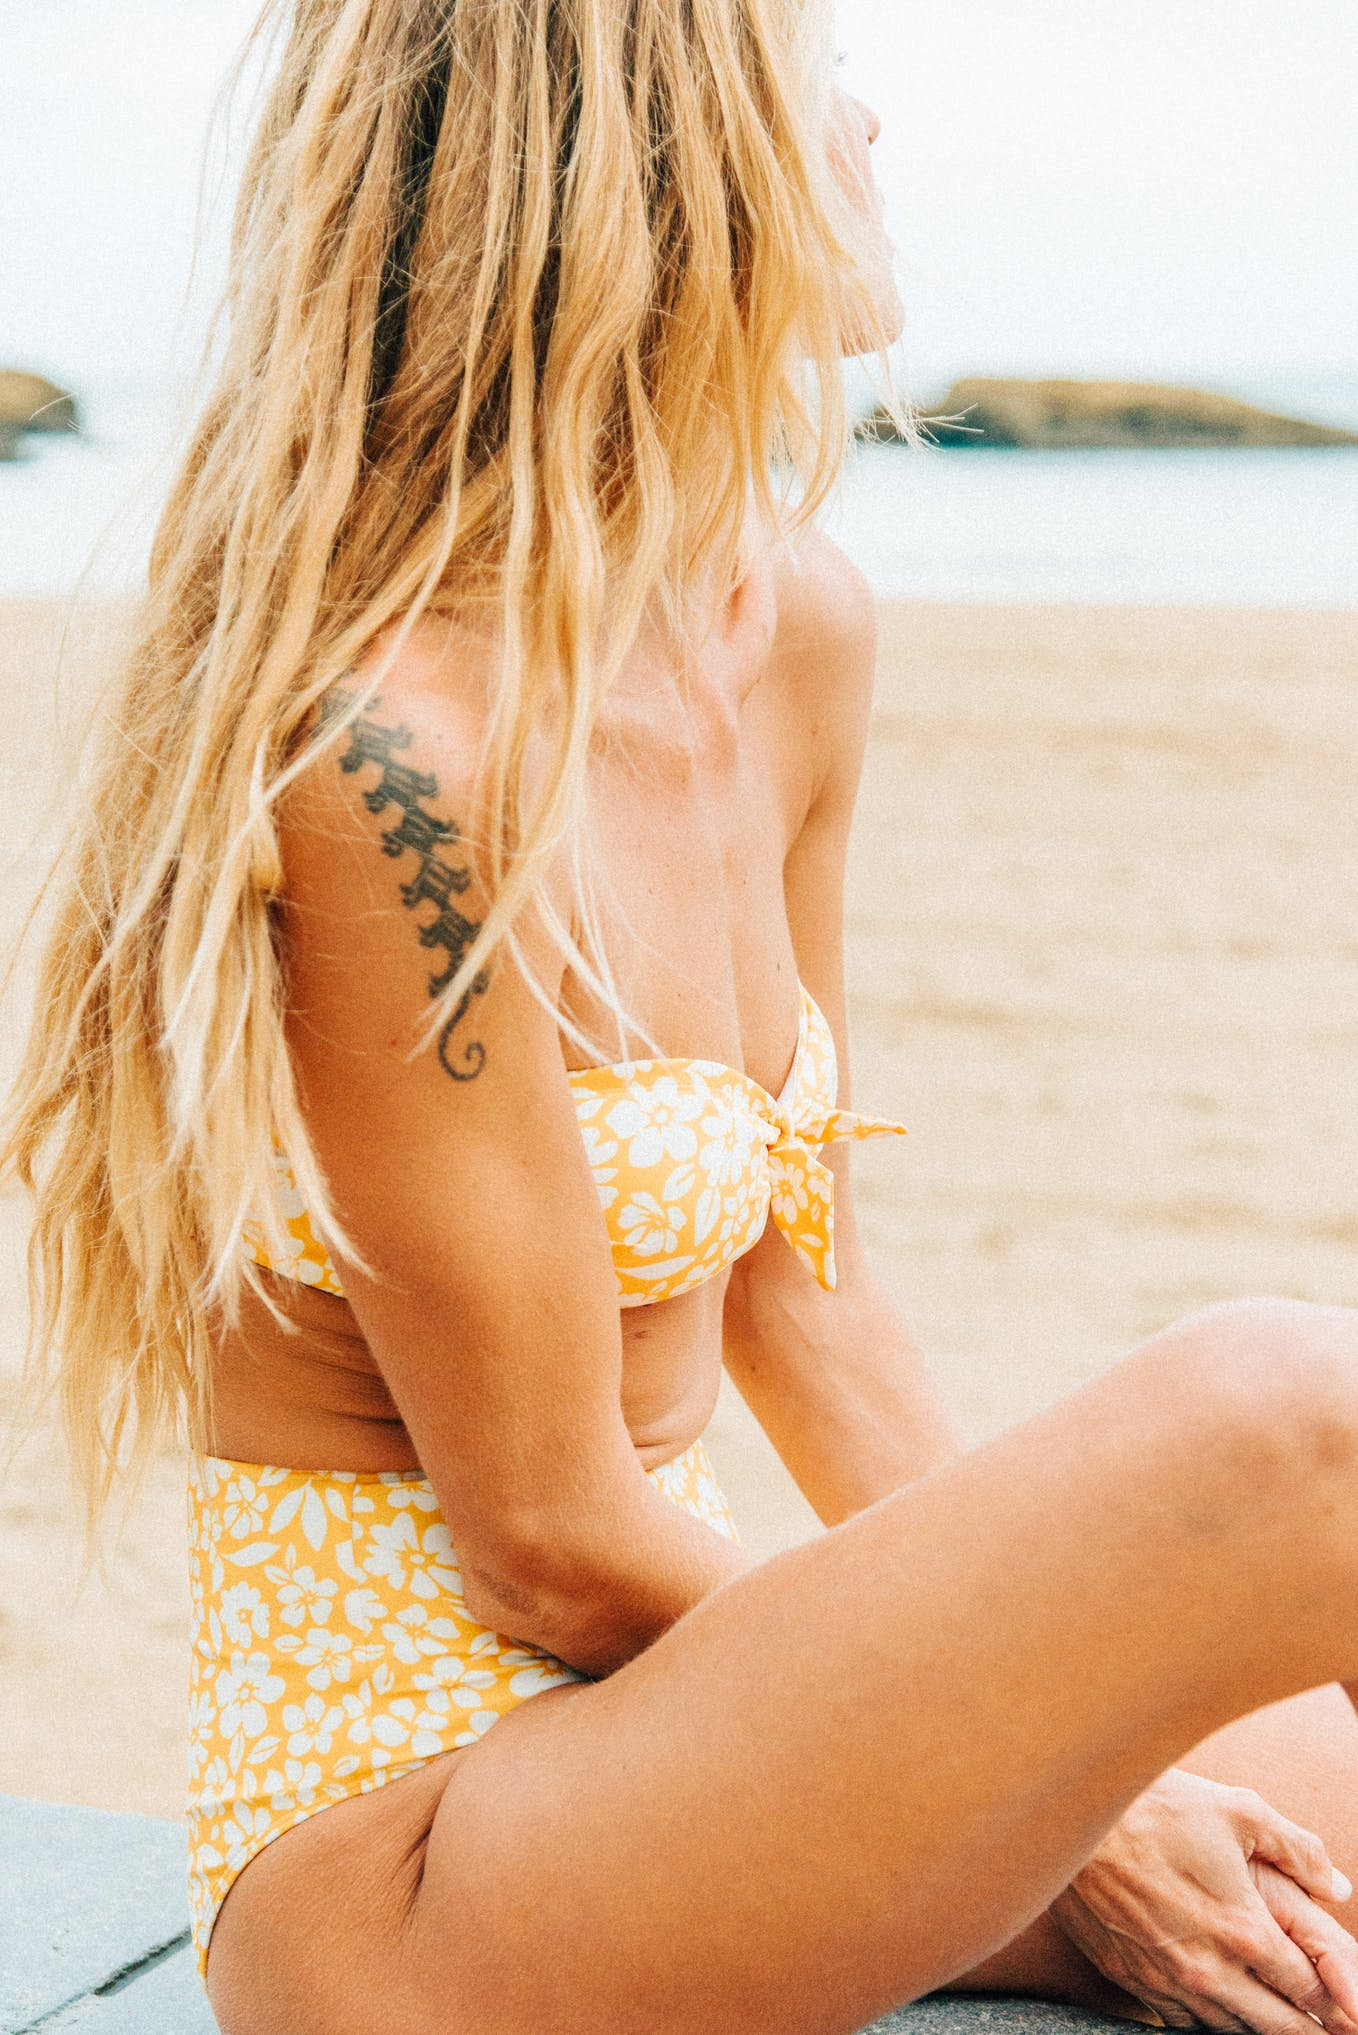 Bikini Sur le sable yellow